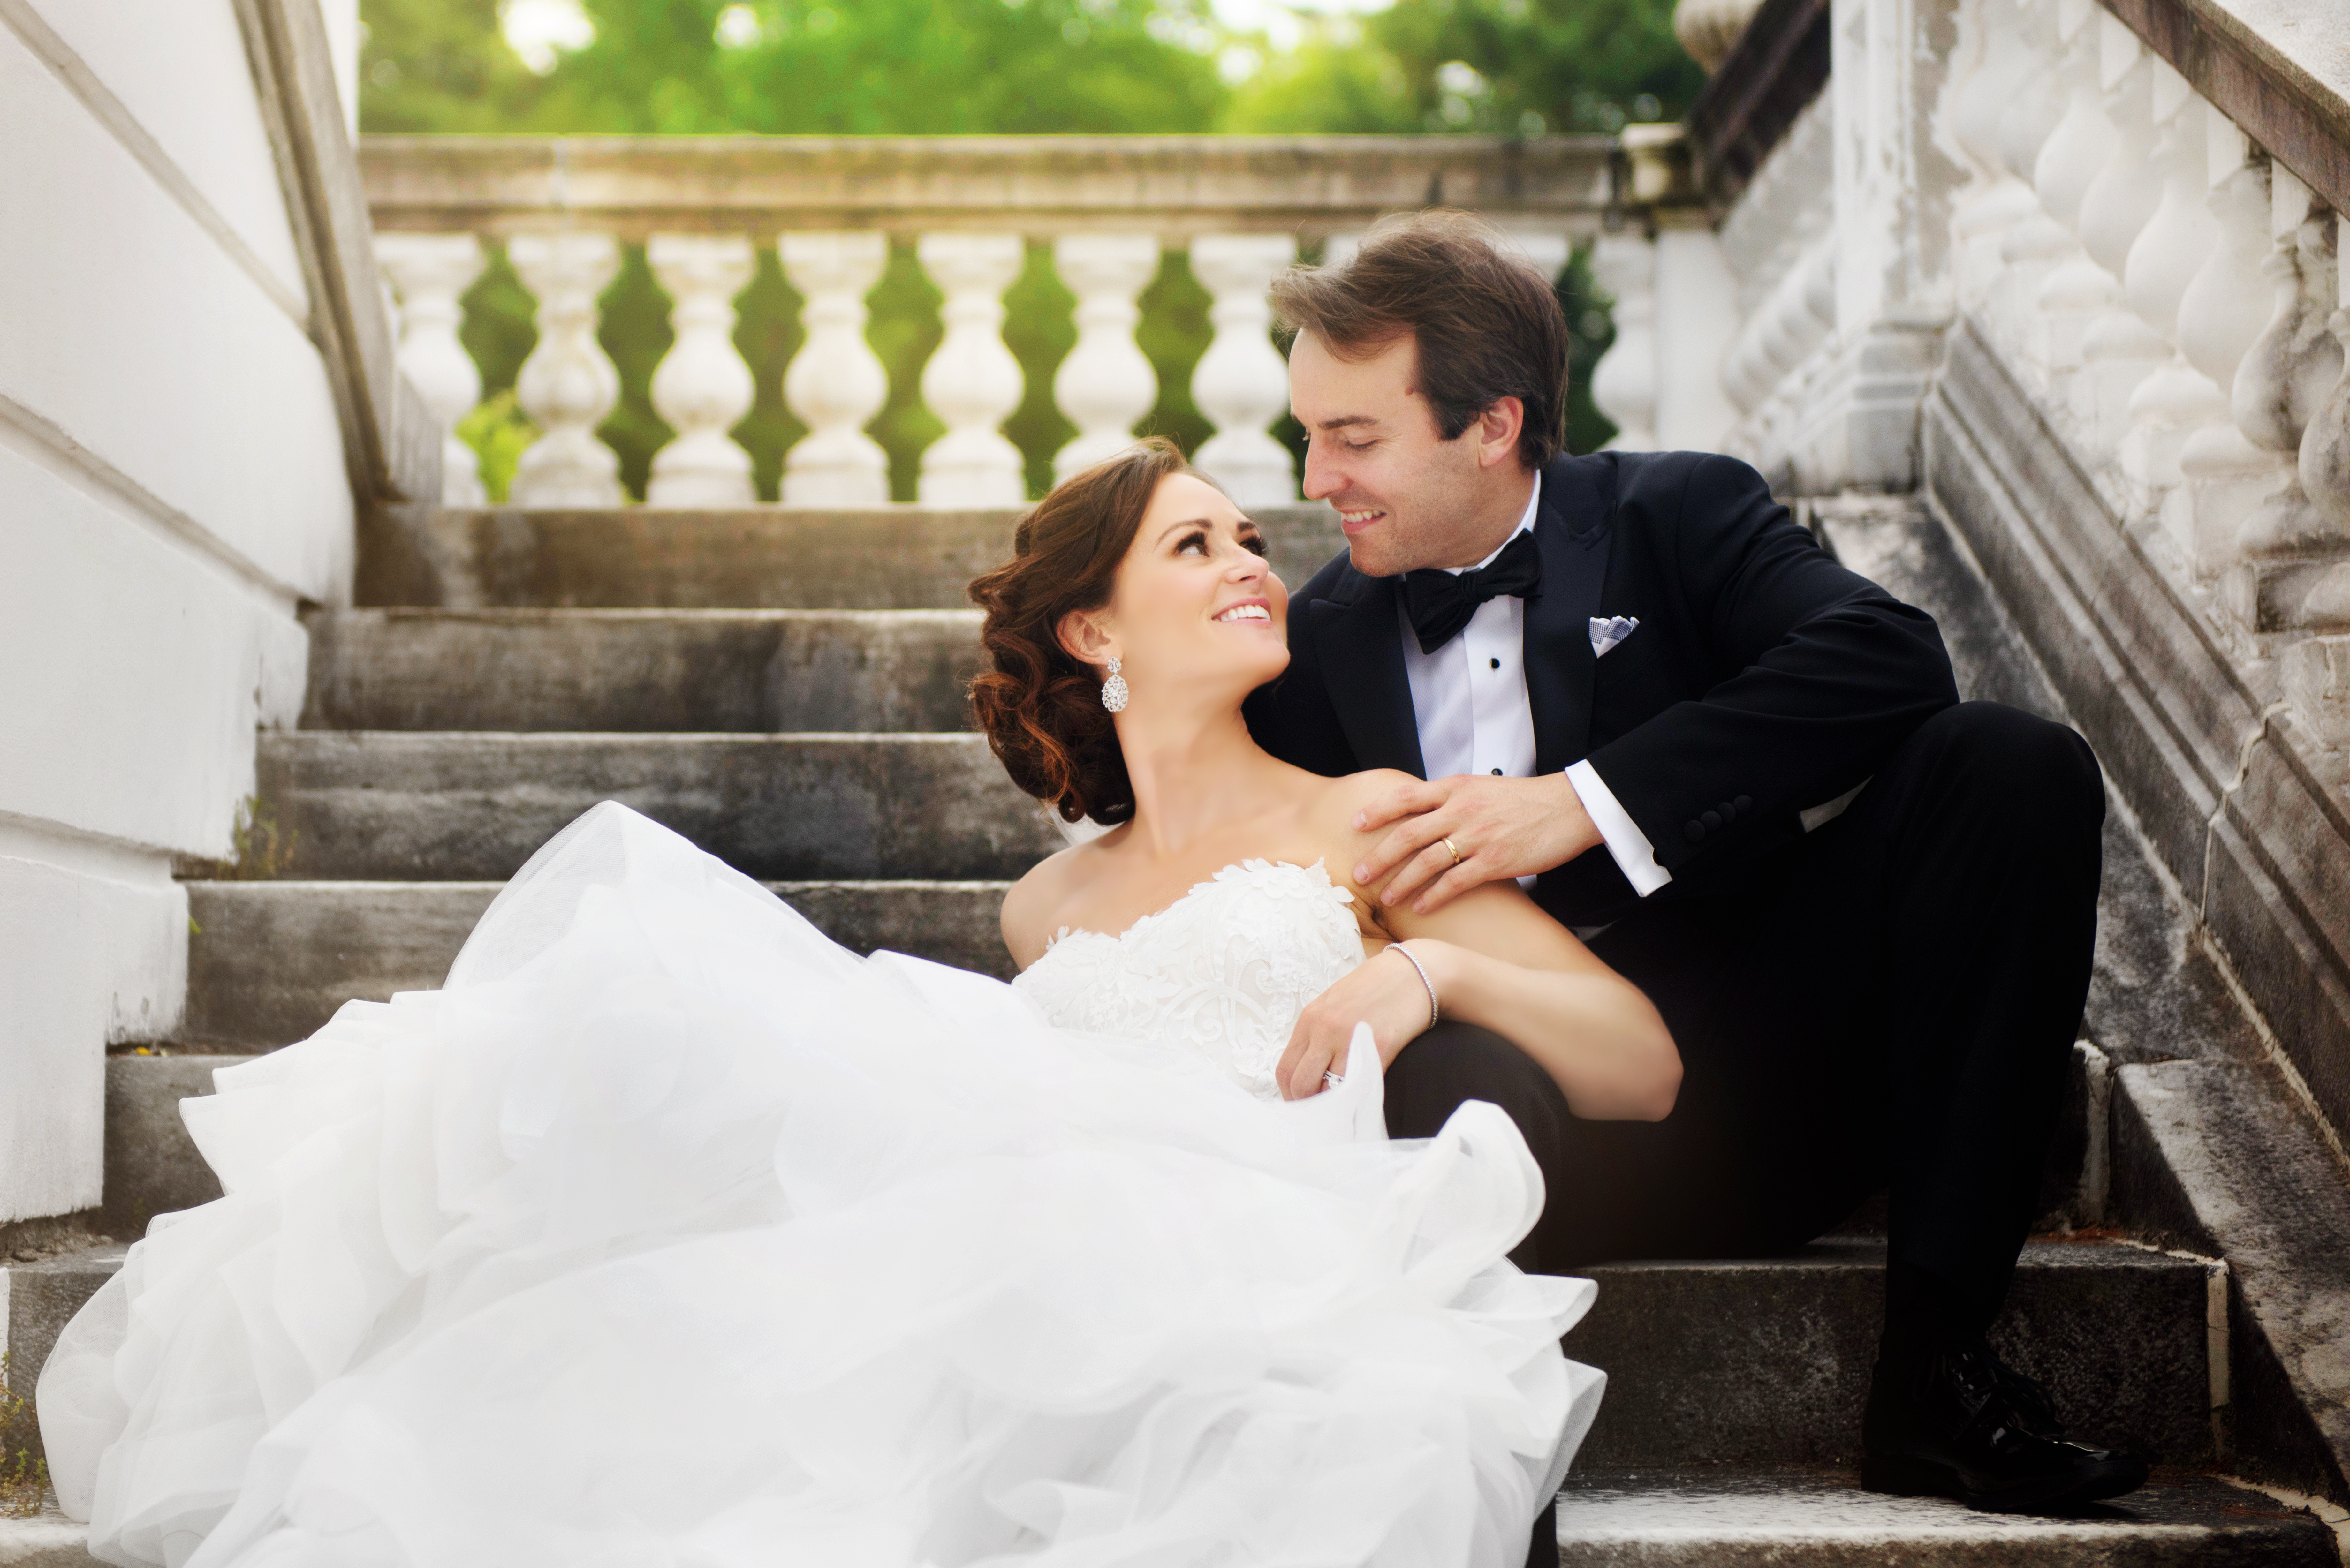 Nicole radakovich wedding